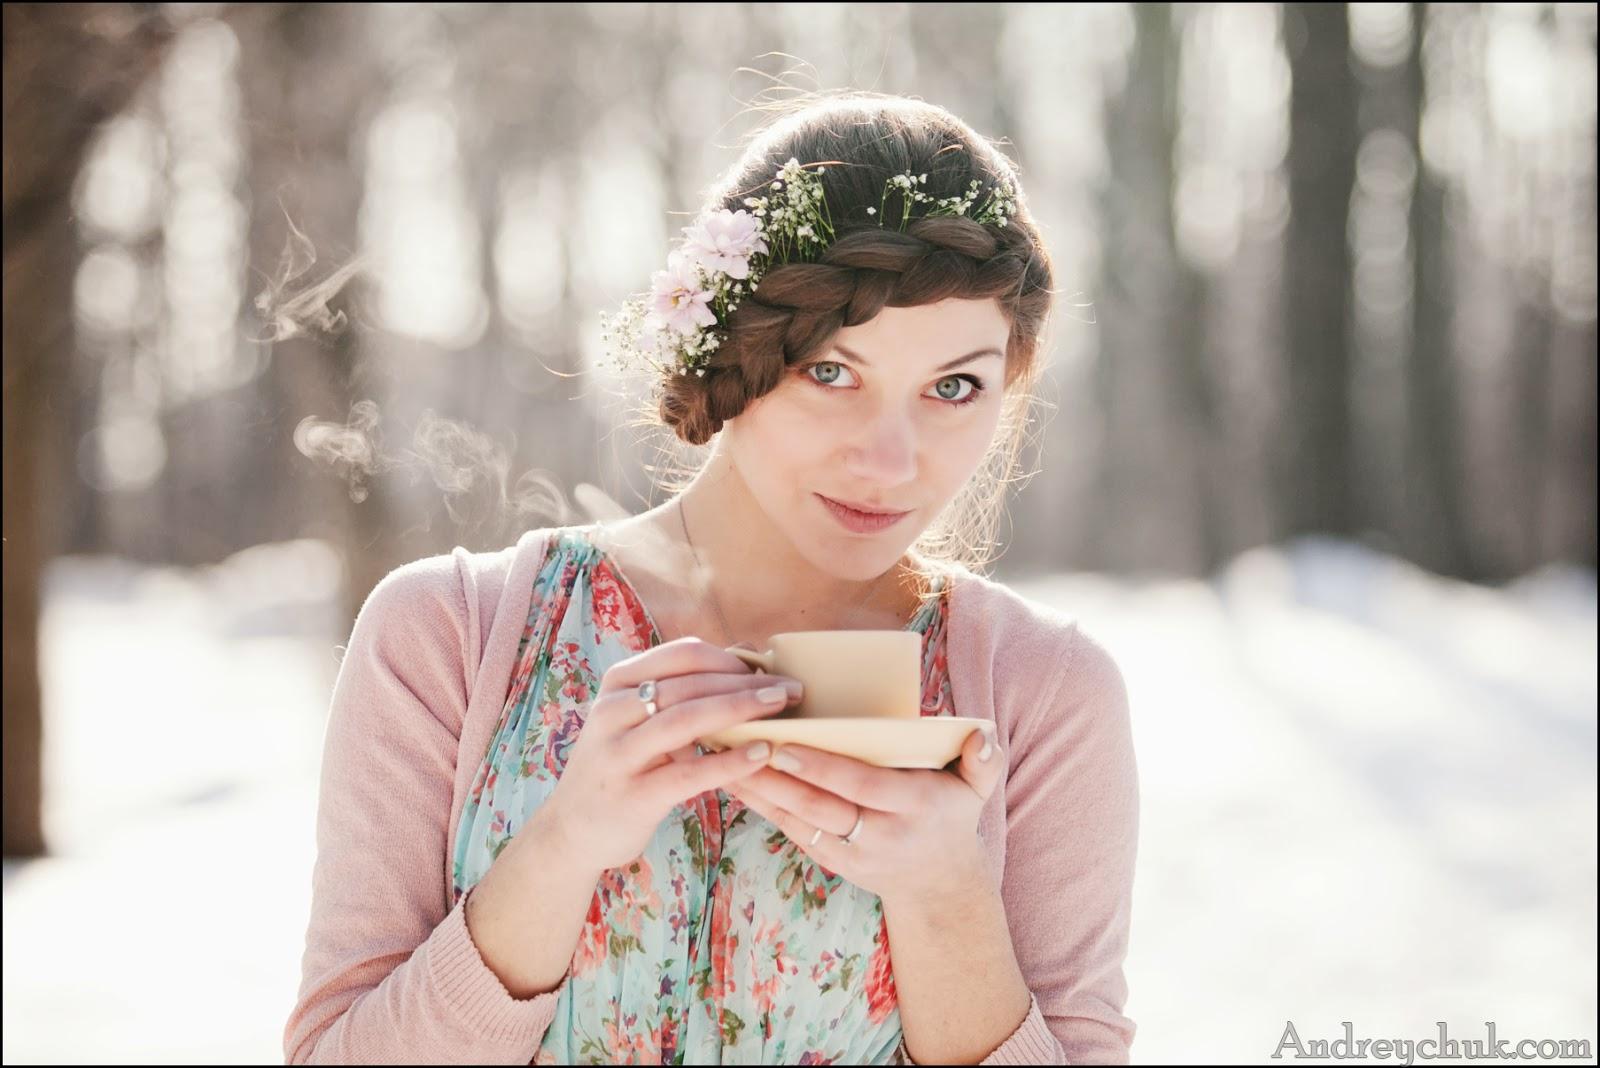 весеннее фото молодой девушки в лесу